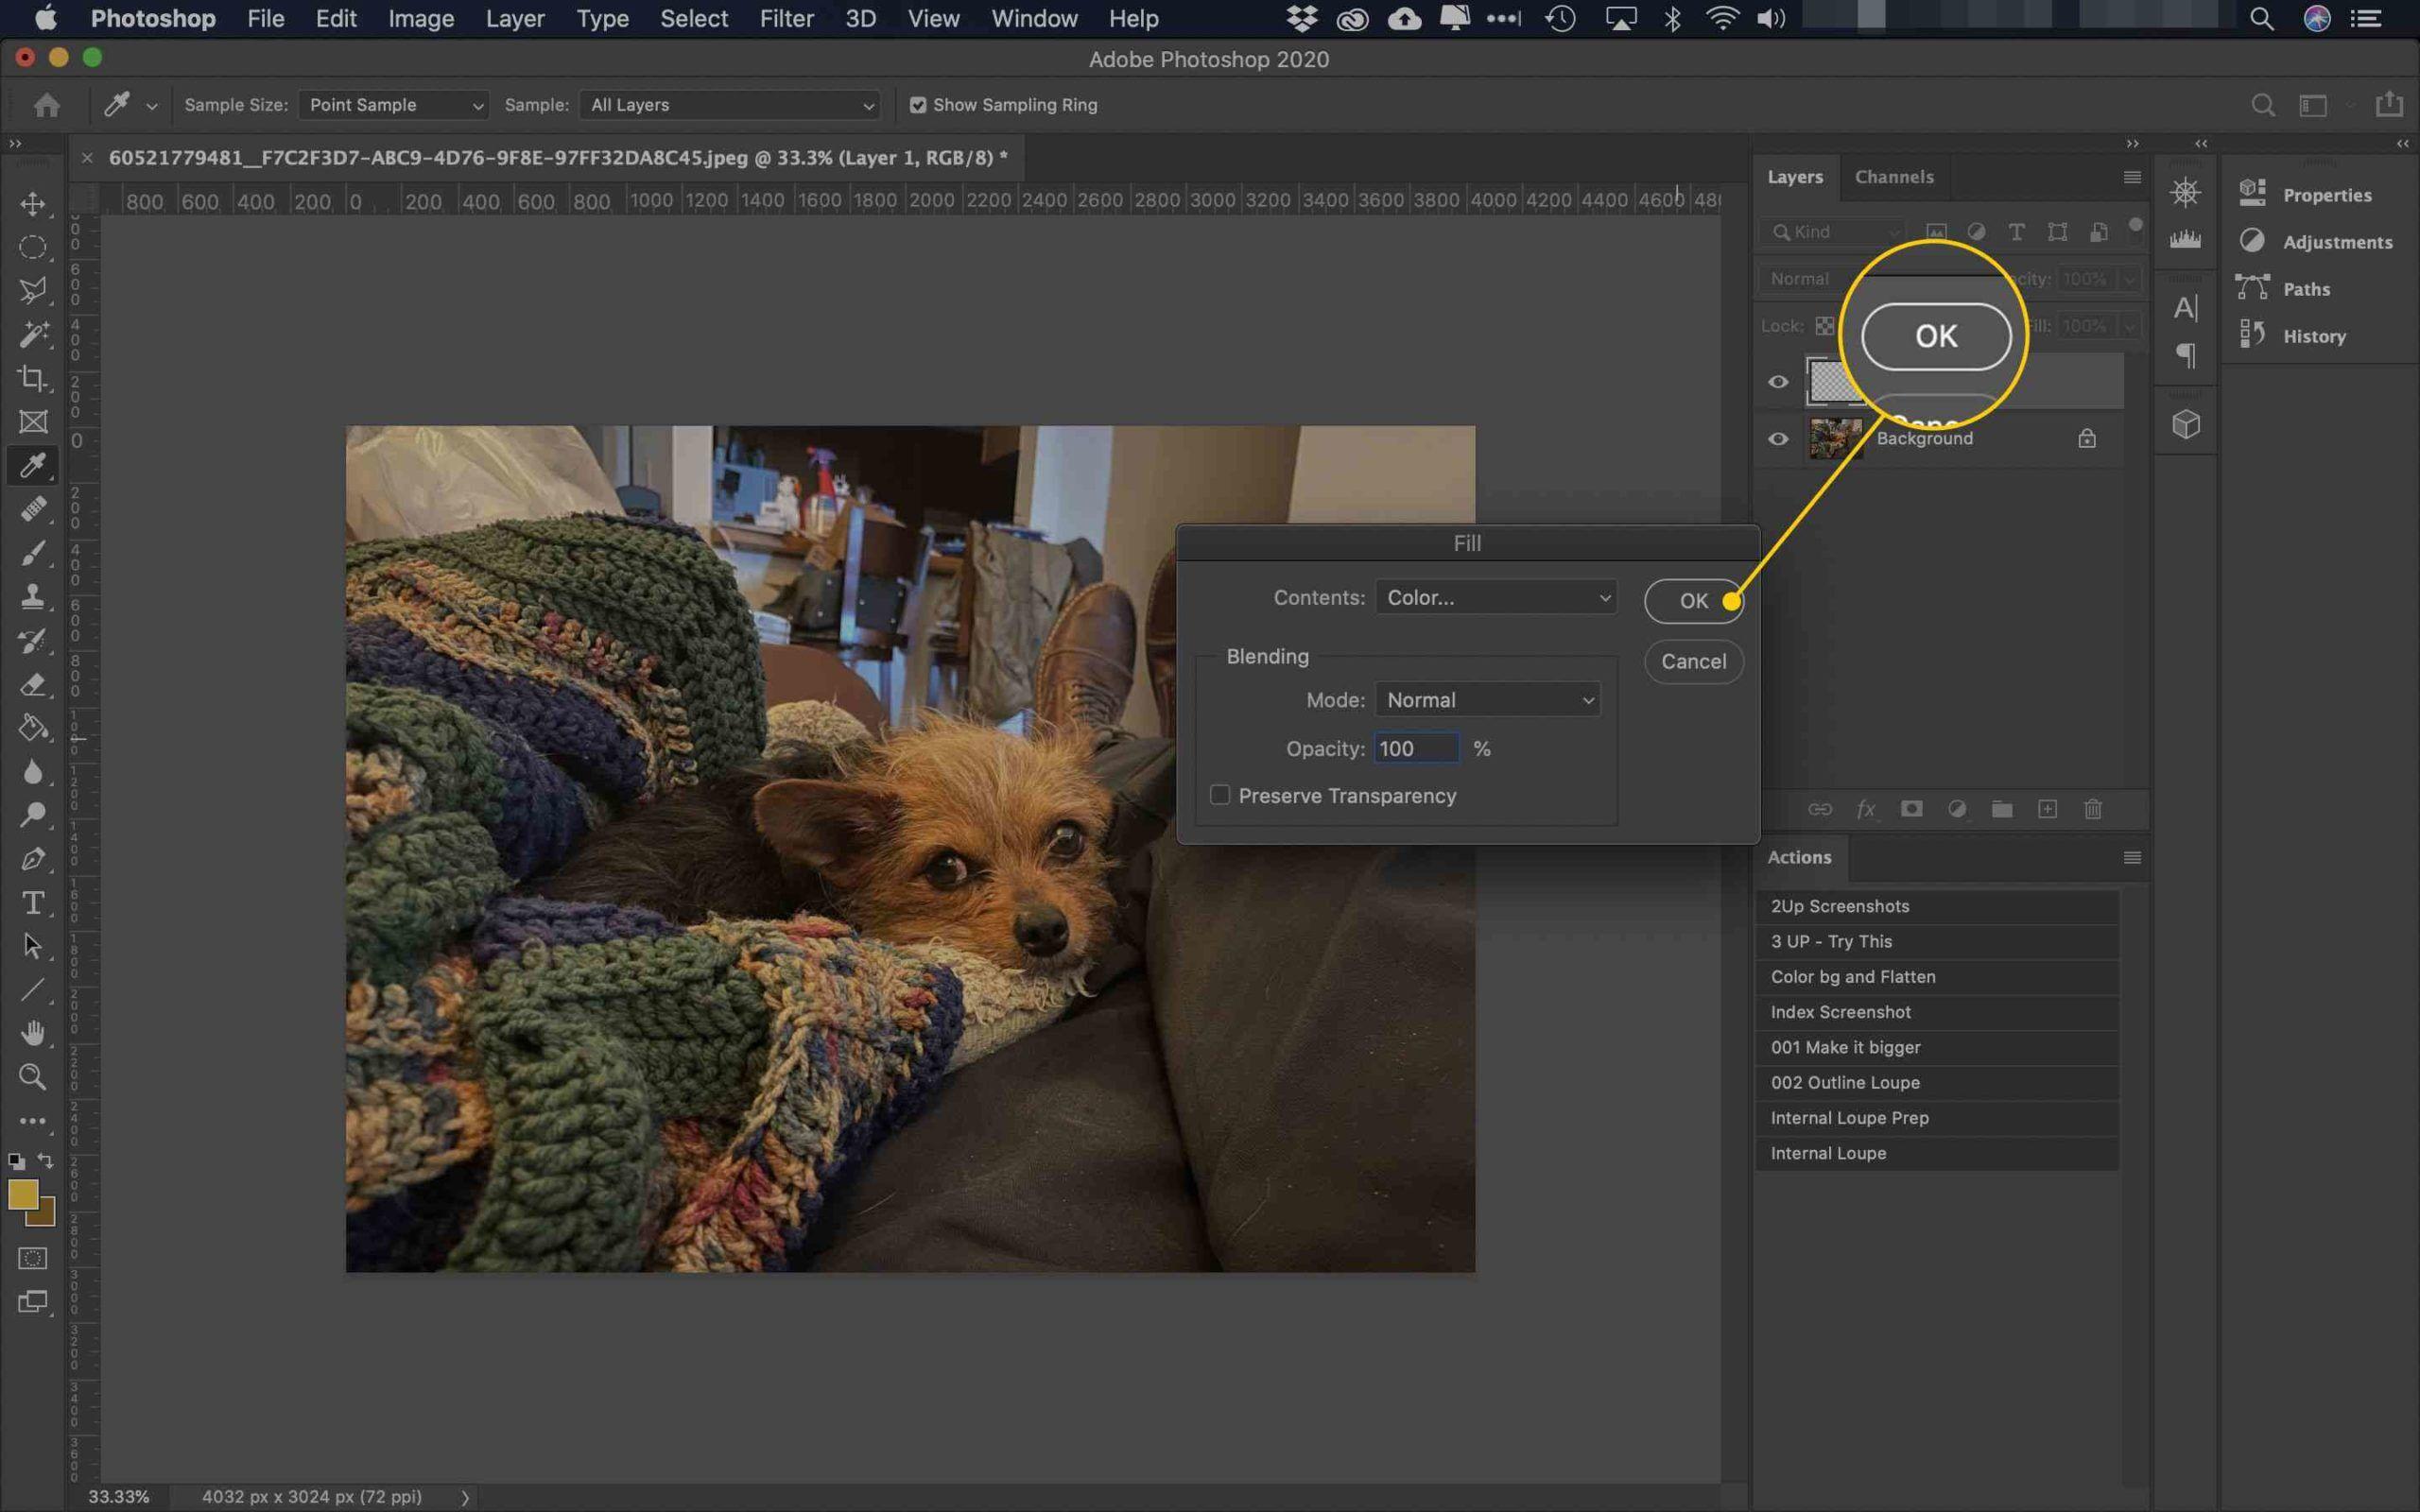 5. Cara Menggunakan Blending Mode Photoshop scaled